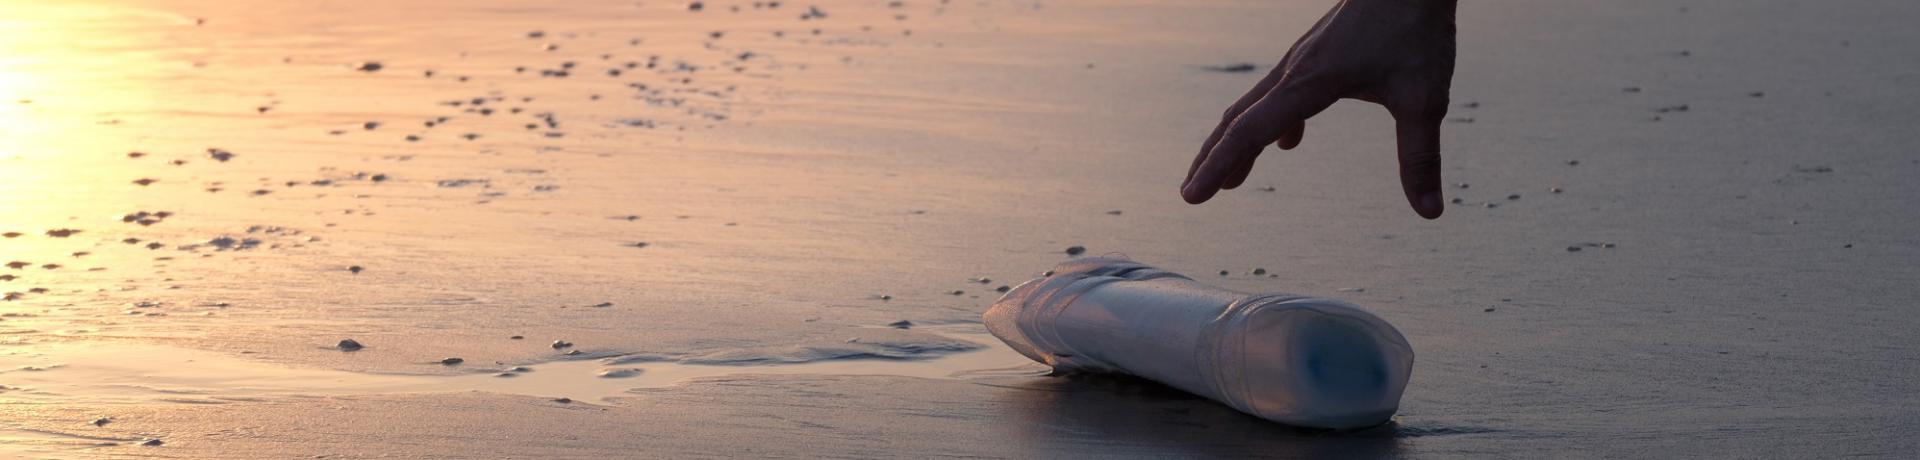 Sonstiges: Strand Plastikmüll